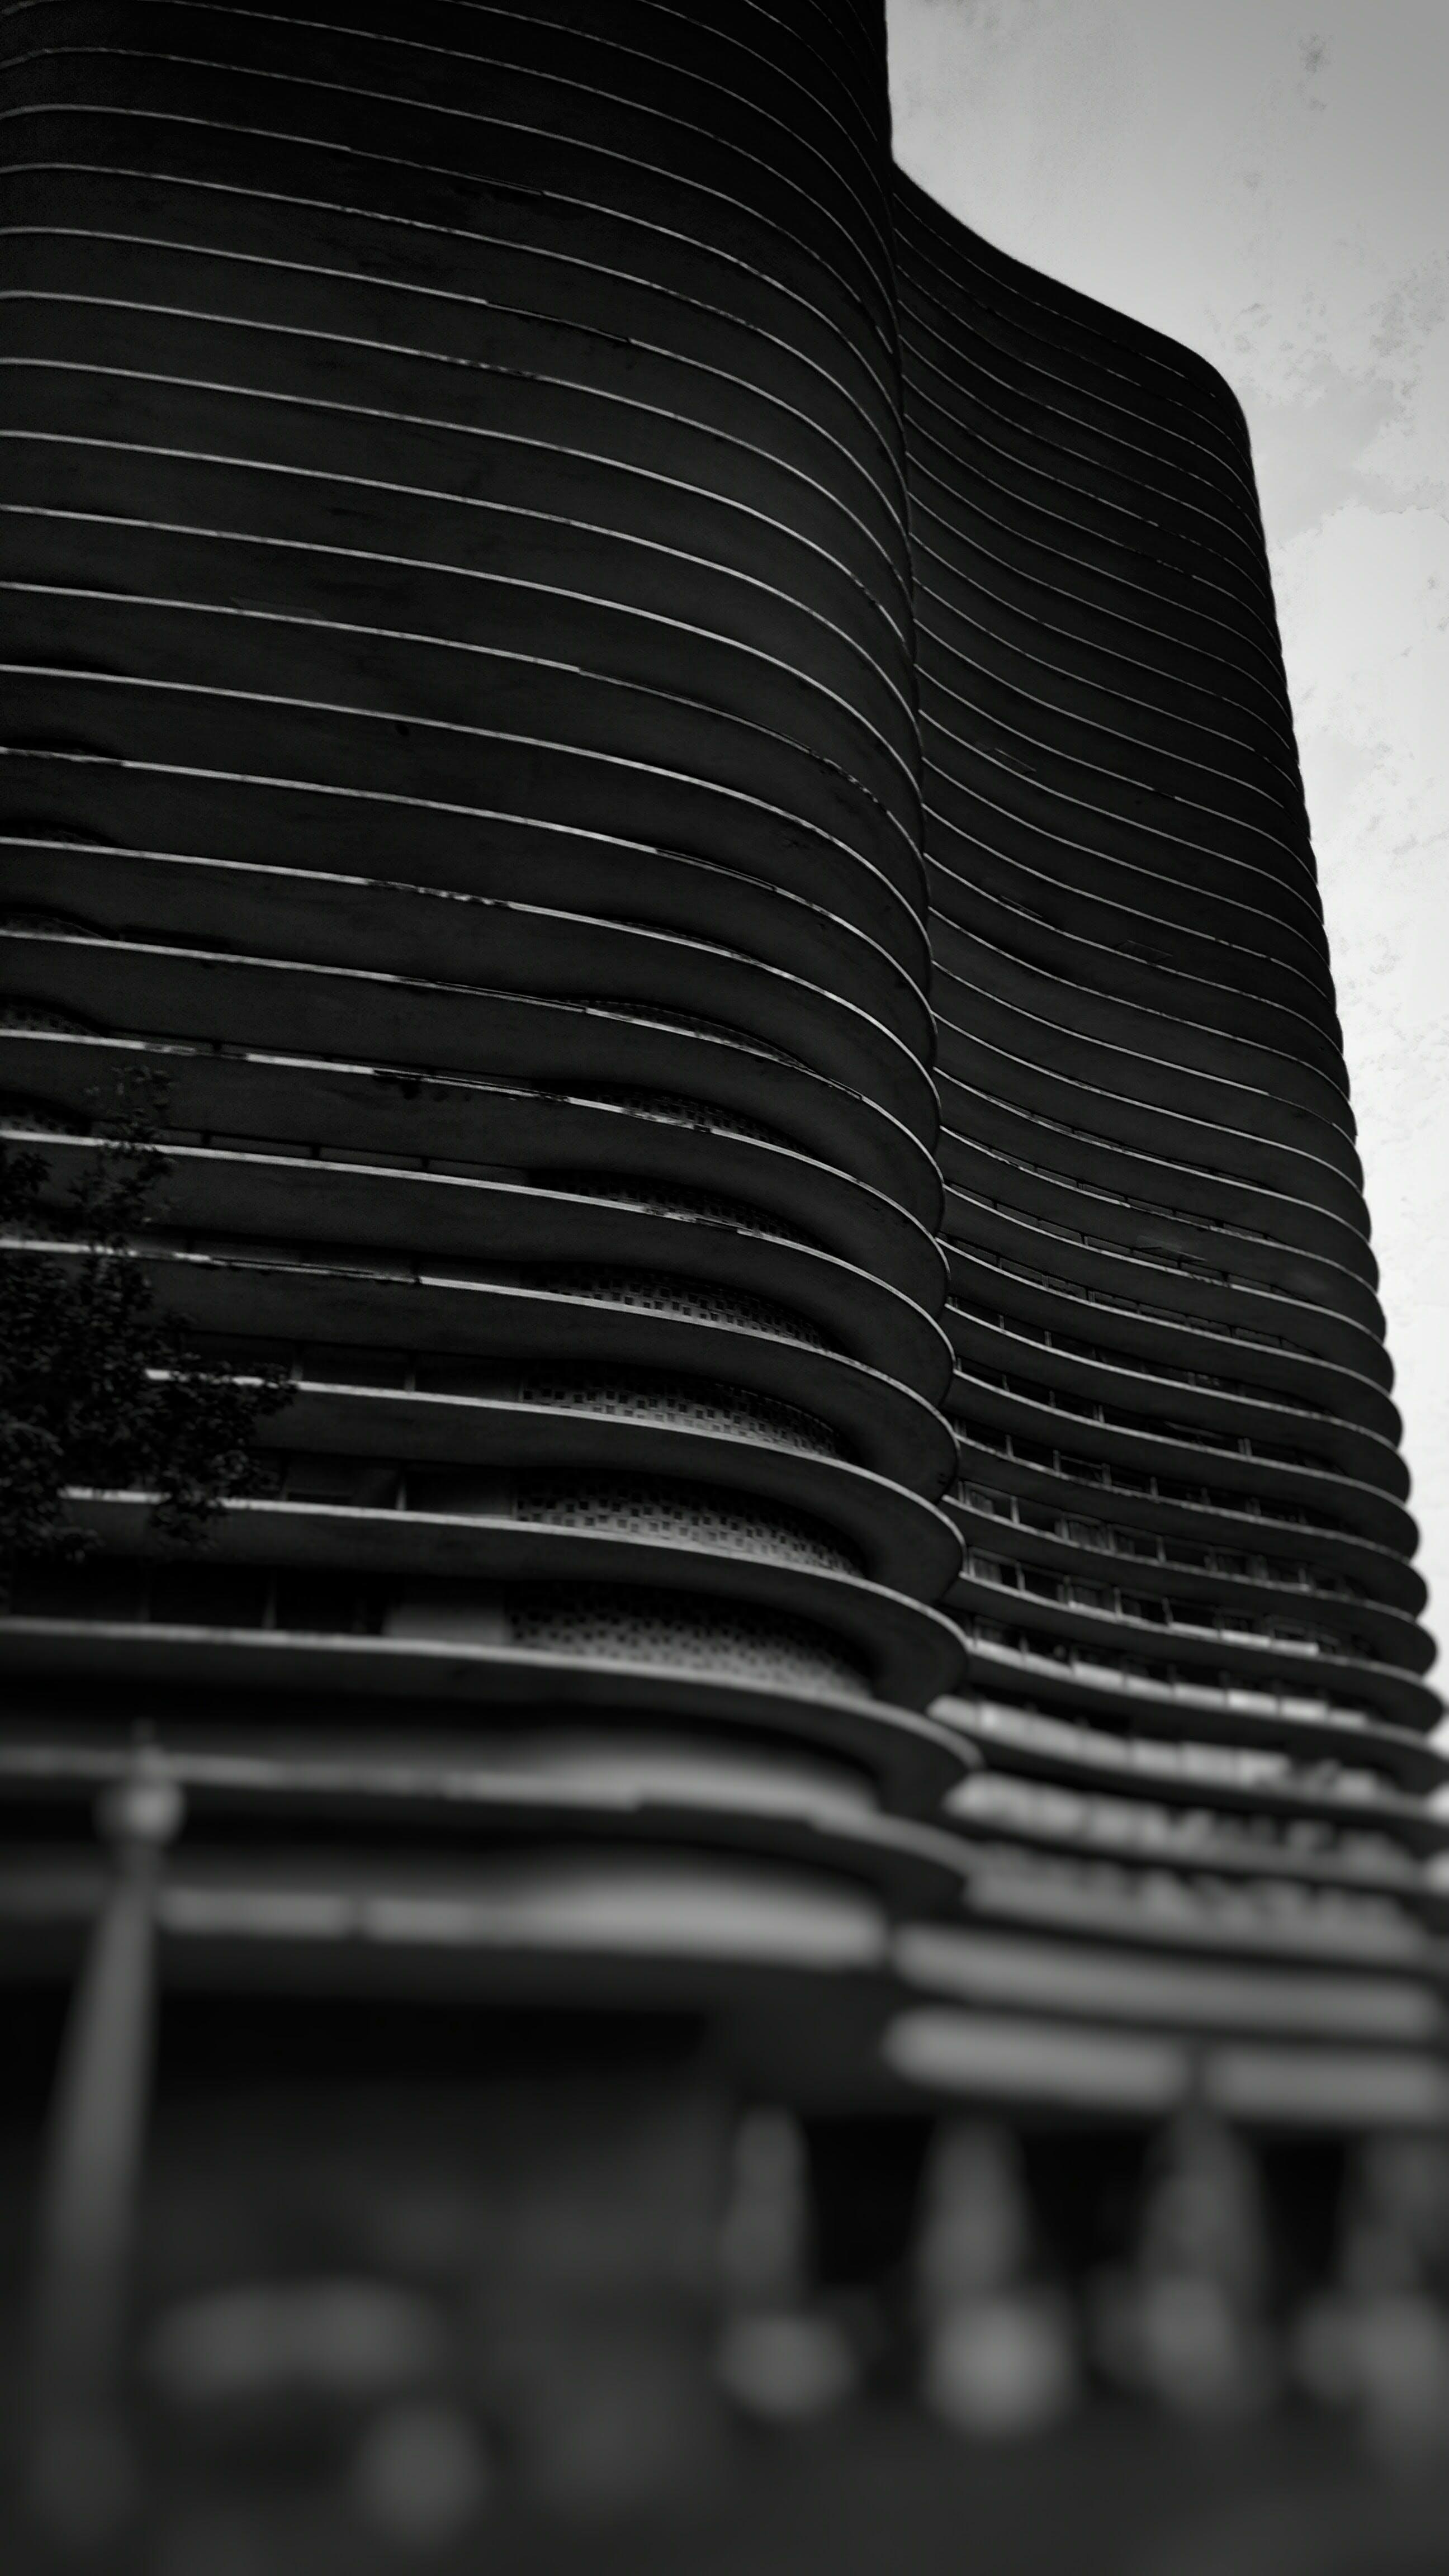 Free stock photo of architectural, architecture, black, black and white